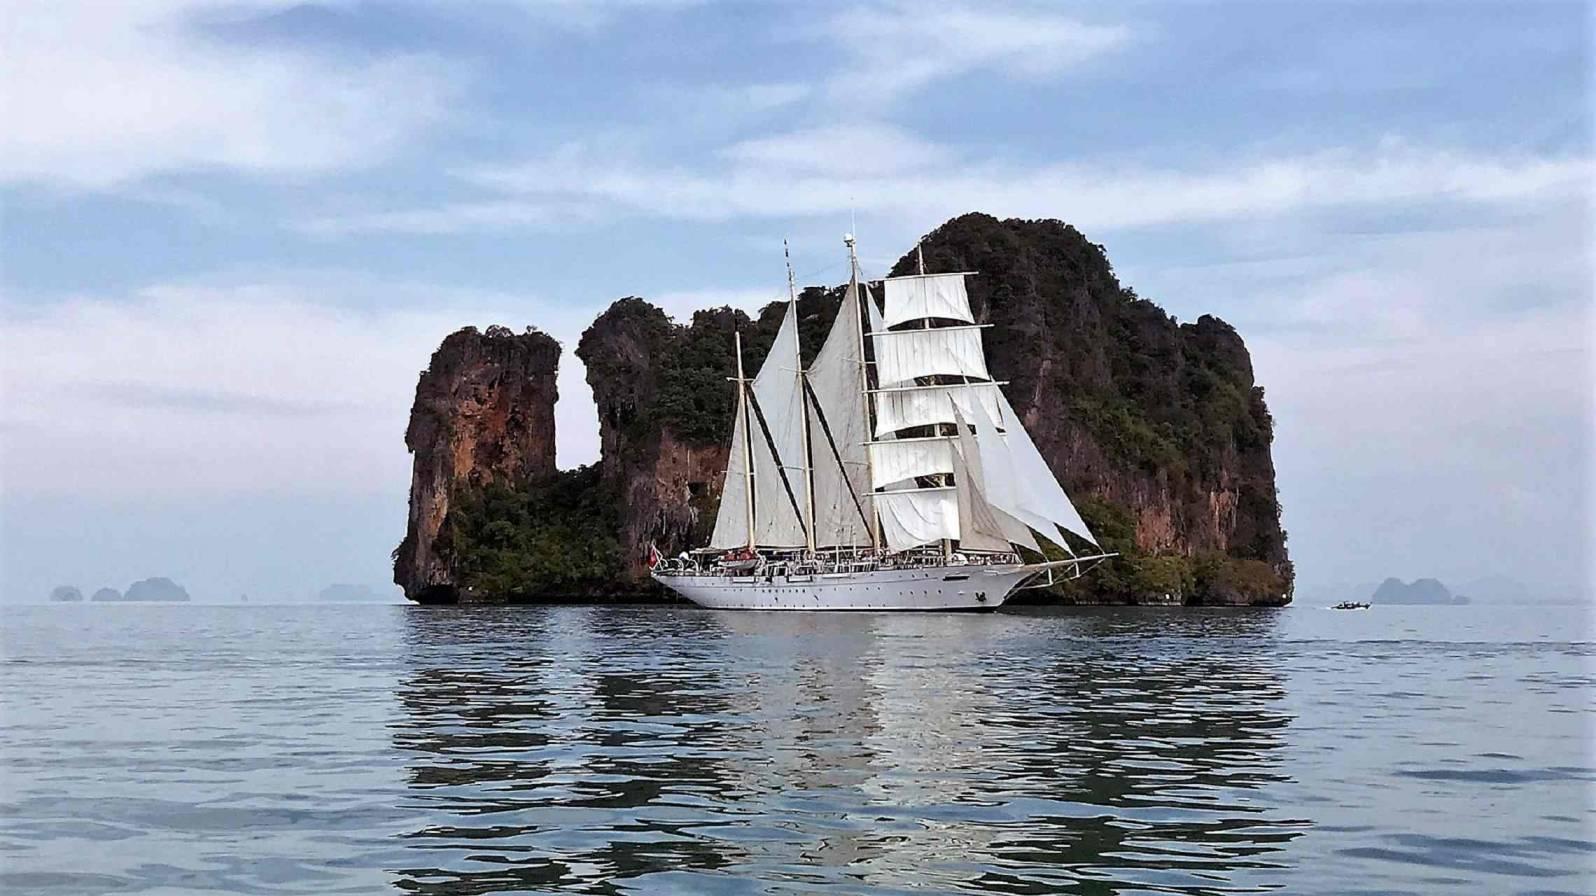 Kristina-Cruises-Löytöretket-1596x896.jpg